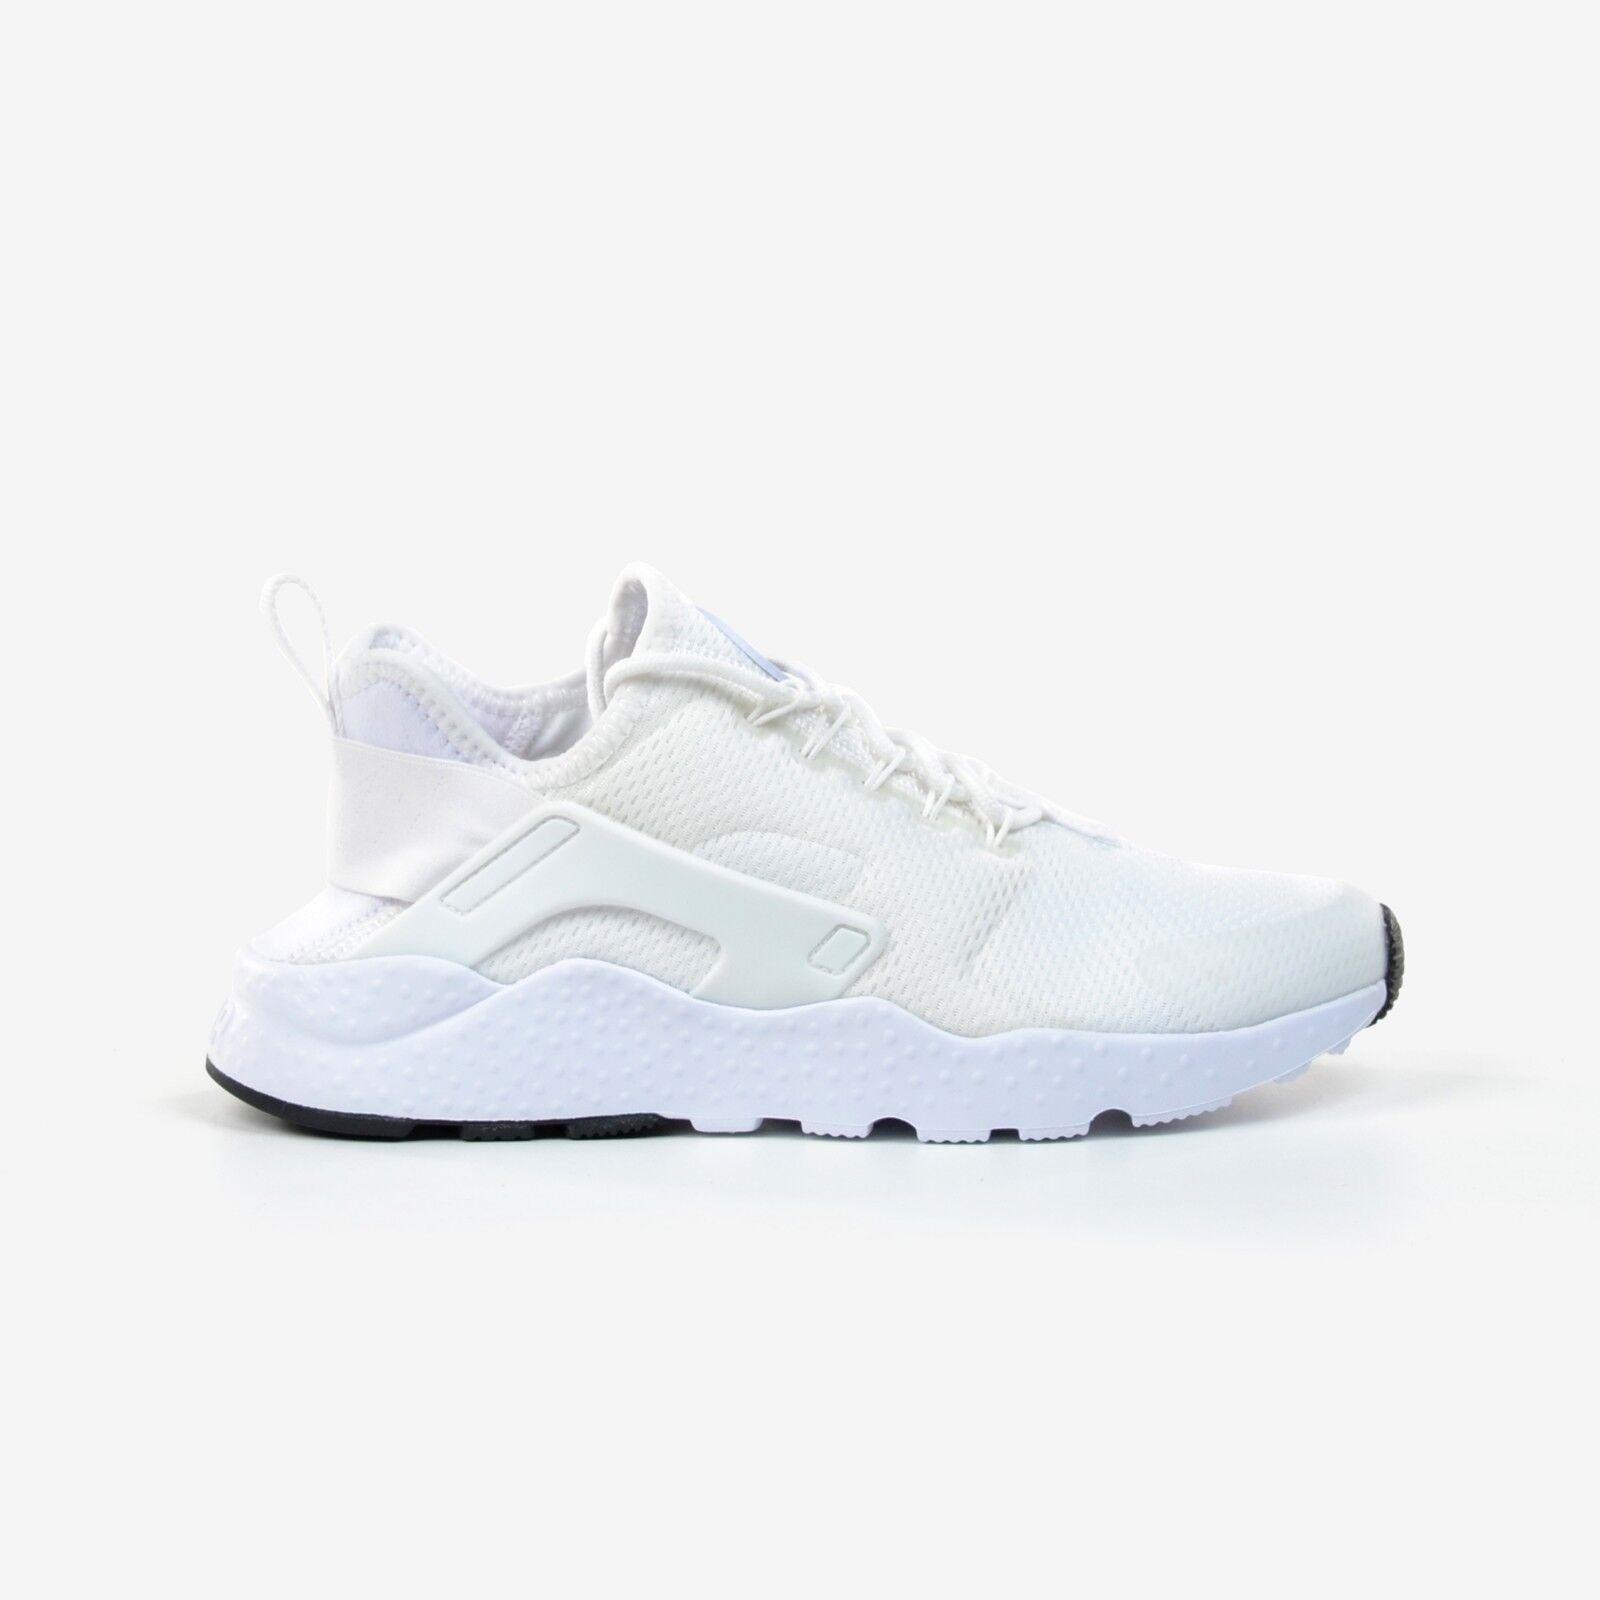 Nike Women's Air Huarache Run Ultra White Black Running Shoes 2017 DS 819151-102